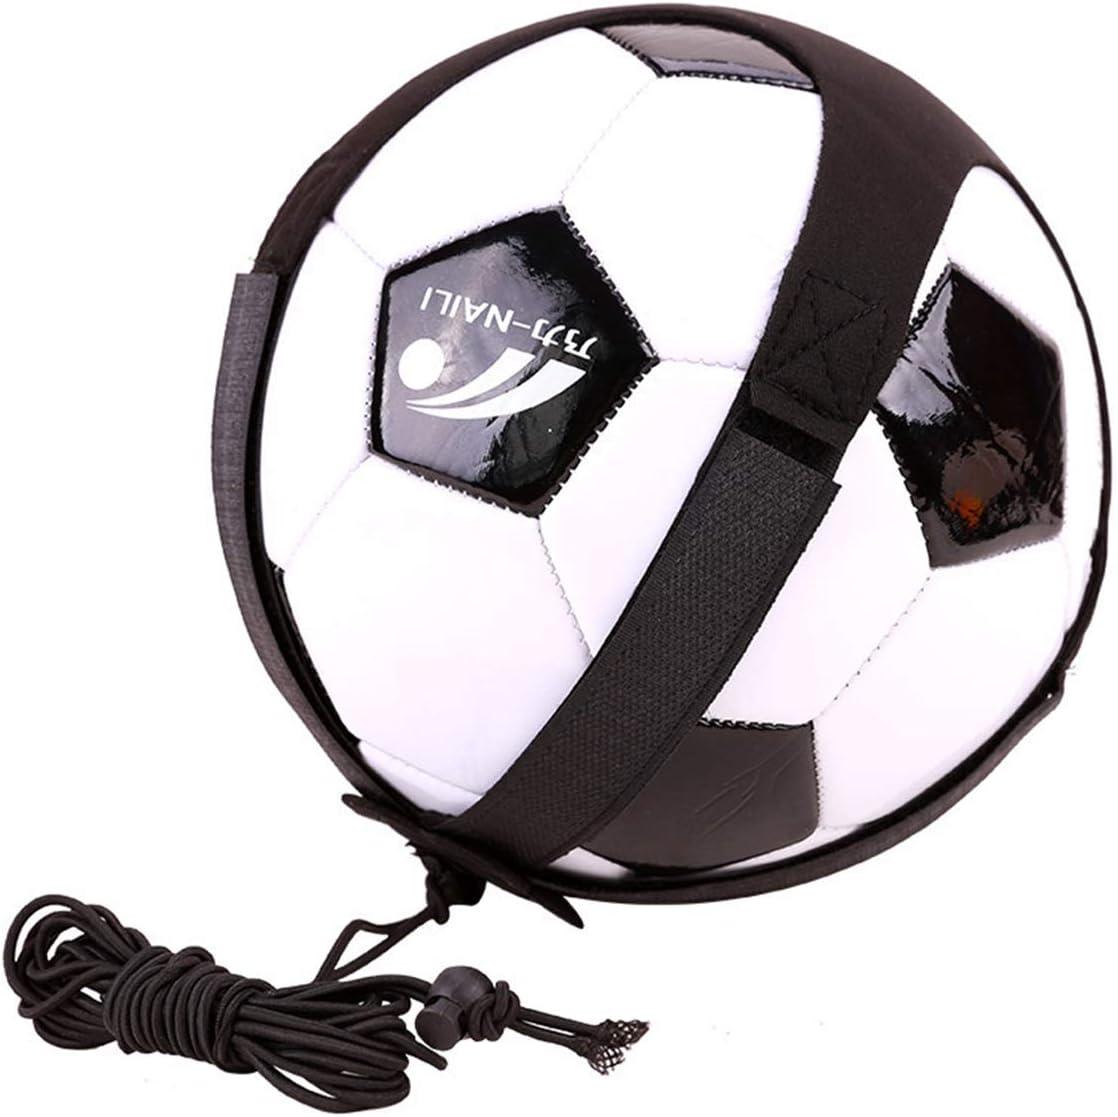 LIOOBO Adjustable Soccer Football Practice Belt Soccer Kick Throw Training Equipment Aid Football Kick Trainer Solo Soccer Trainer Black